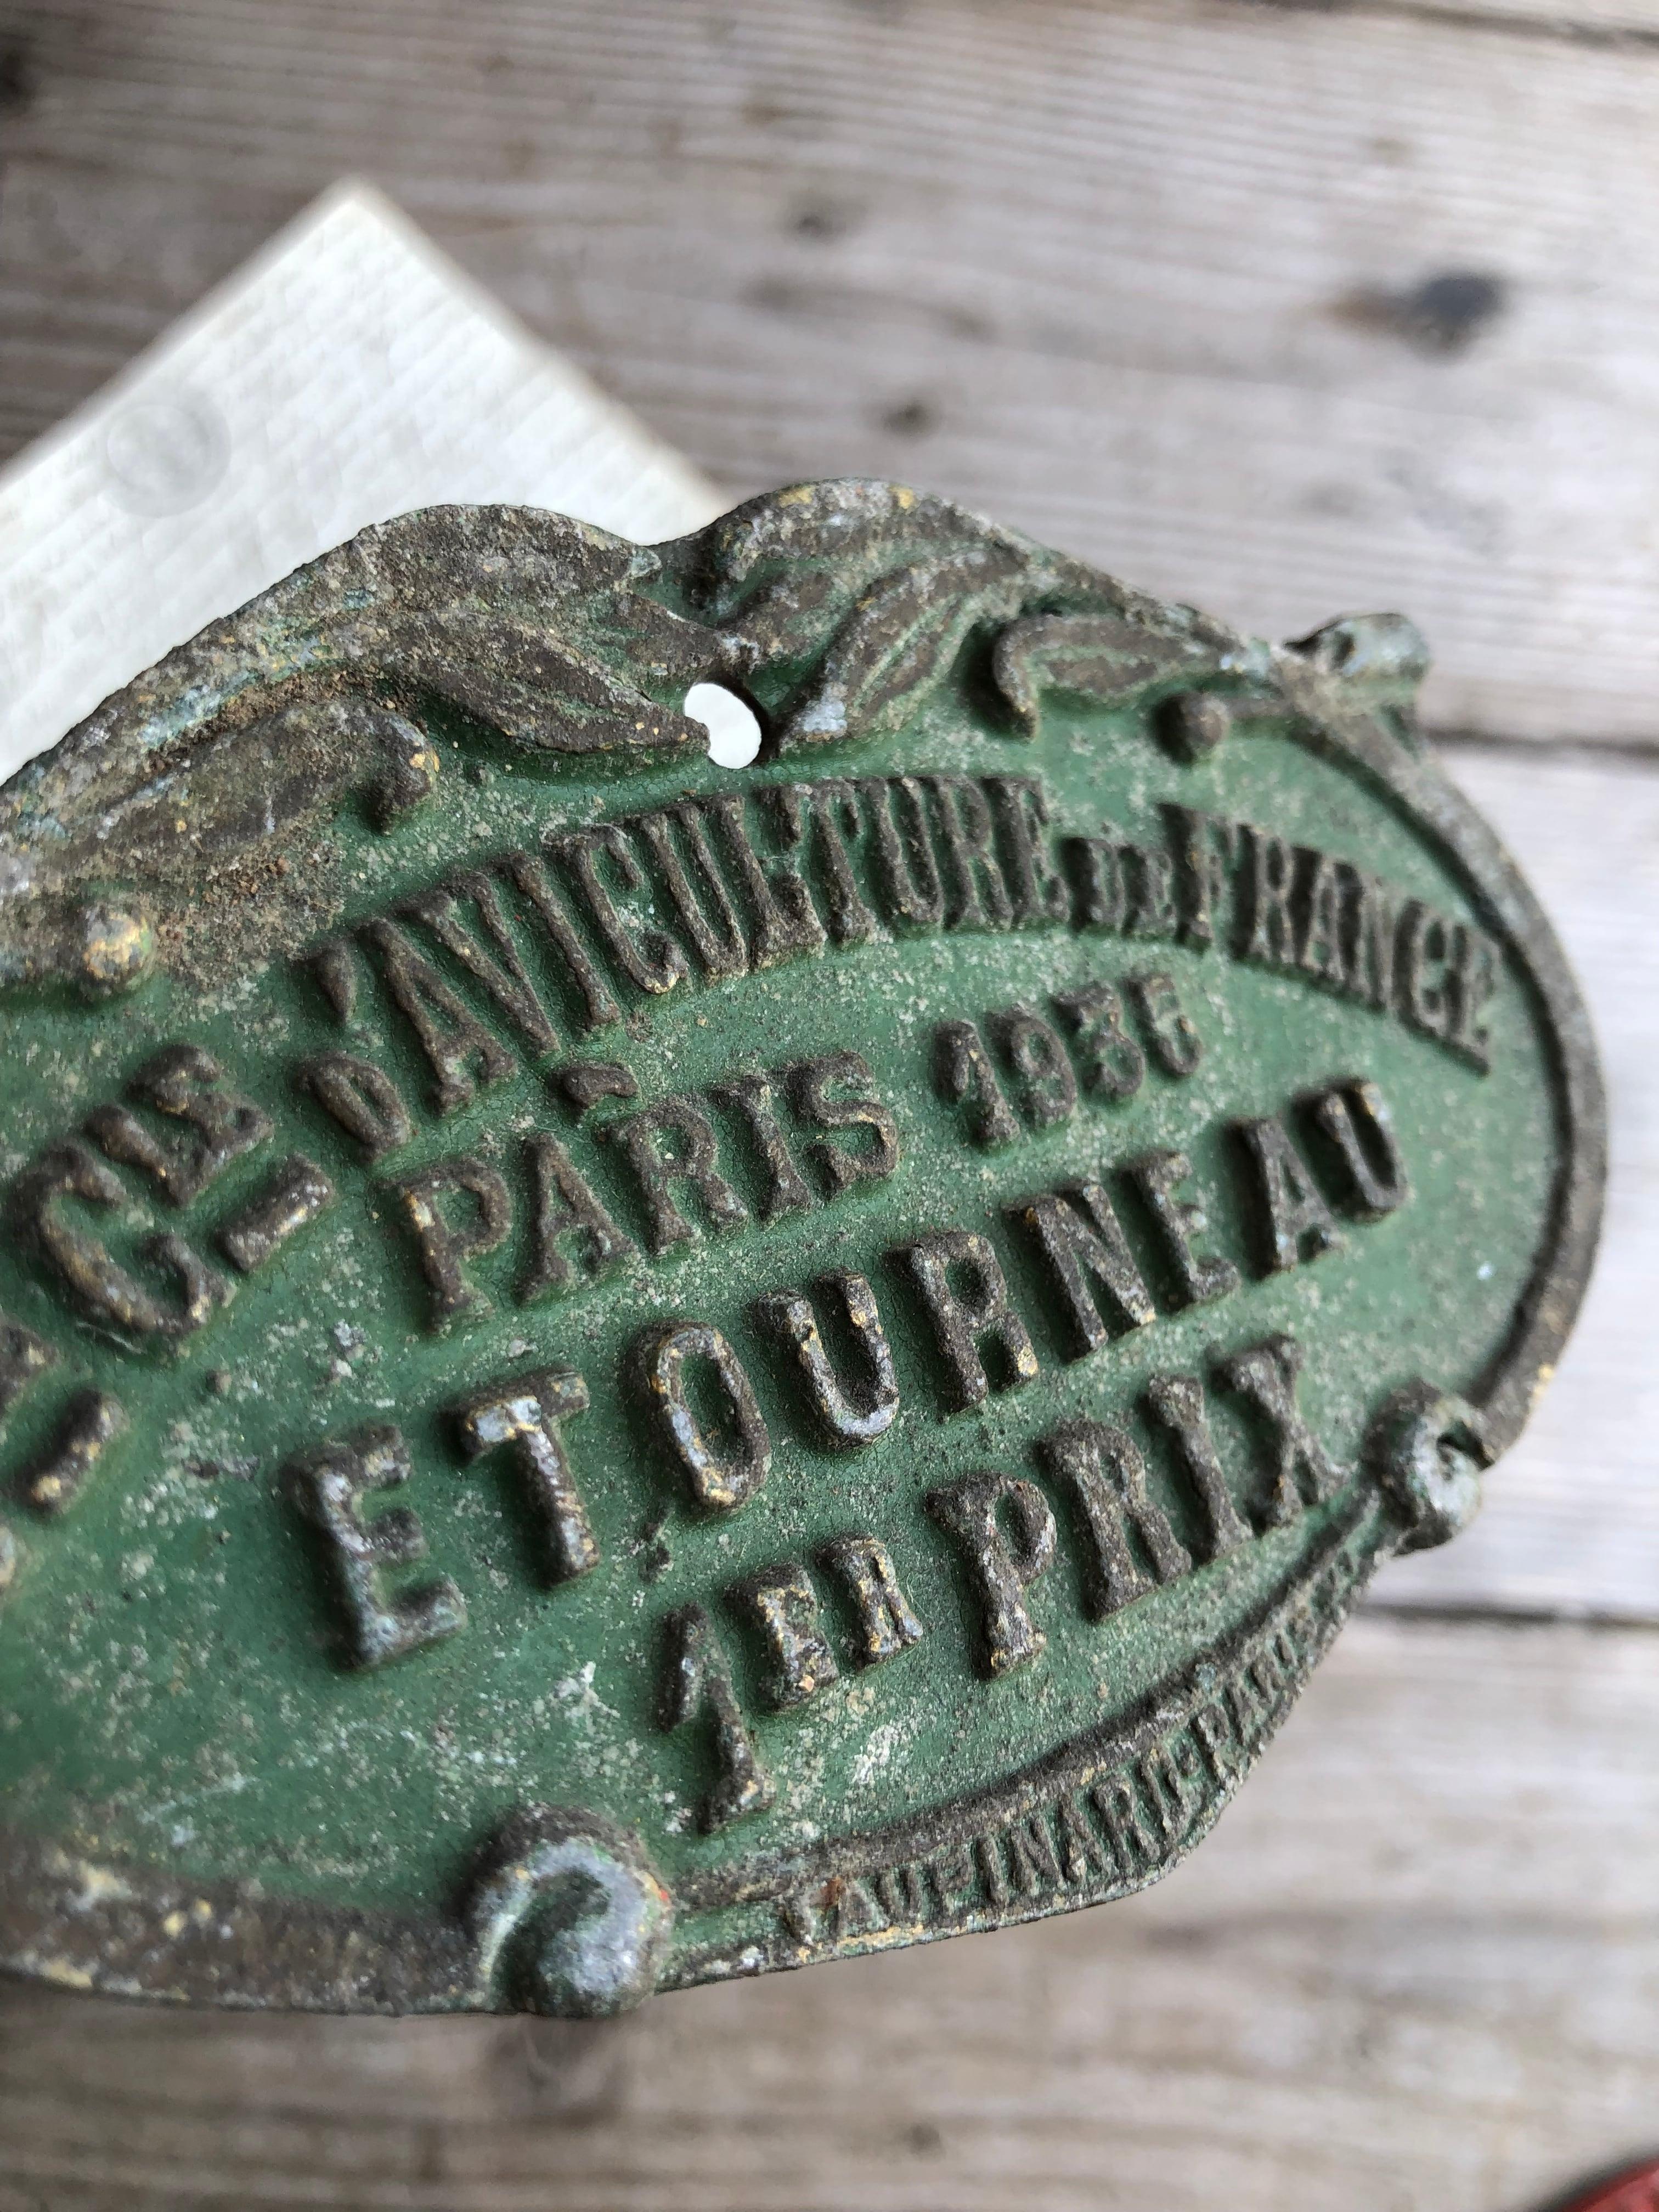 1935 PARIS ETOURNEAU アイアンプレート グリーン